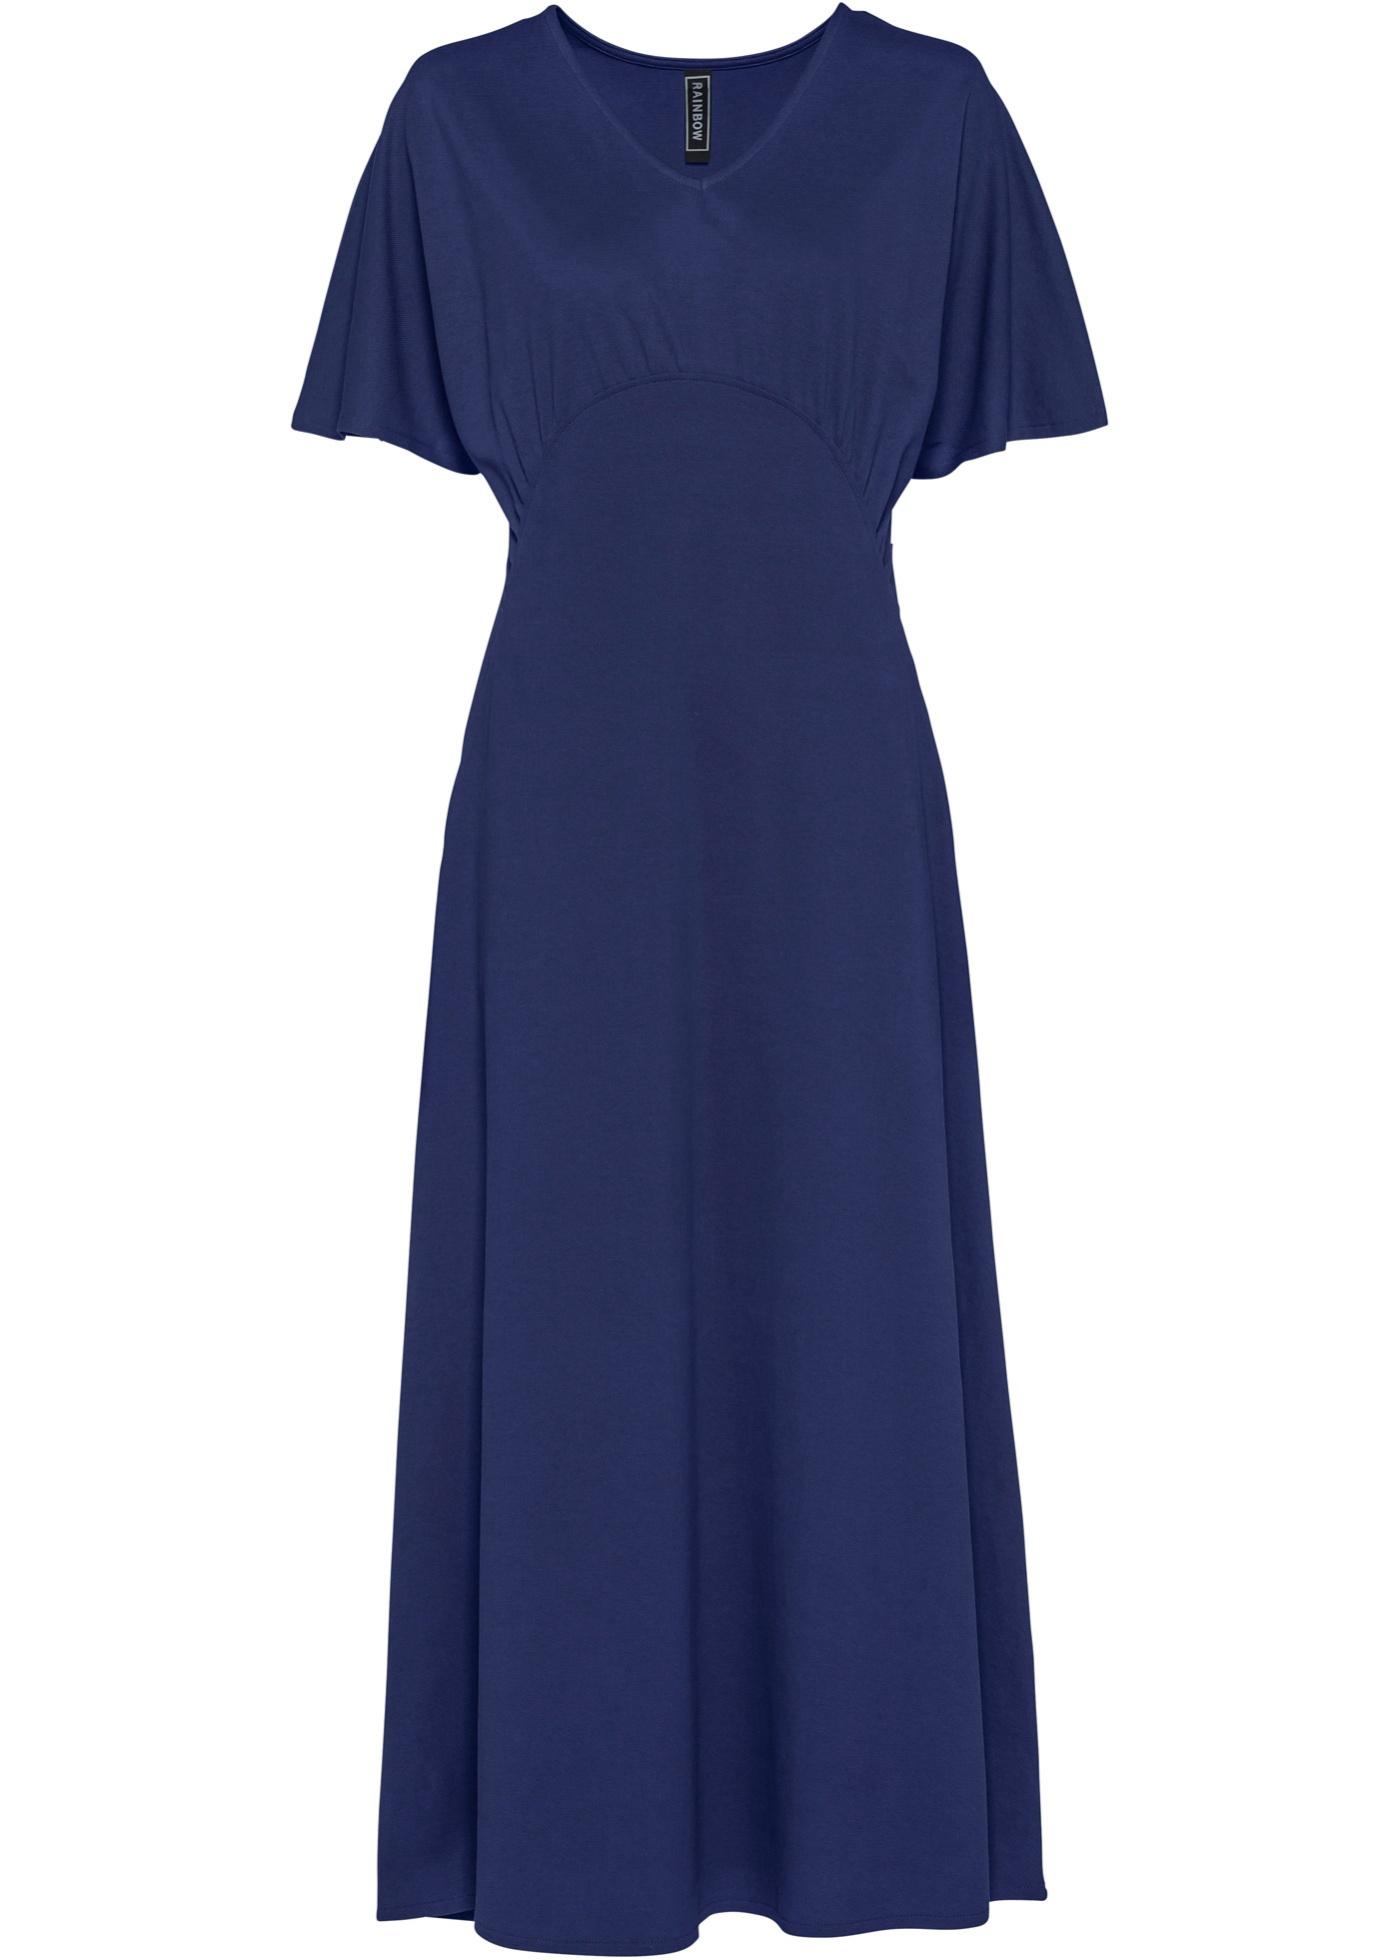 Levné Maxišaty z piké | Modrá barva šatů